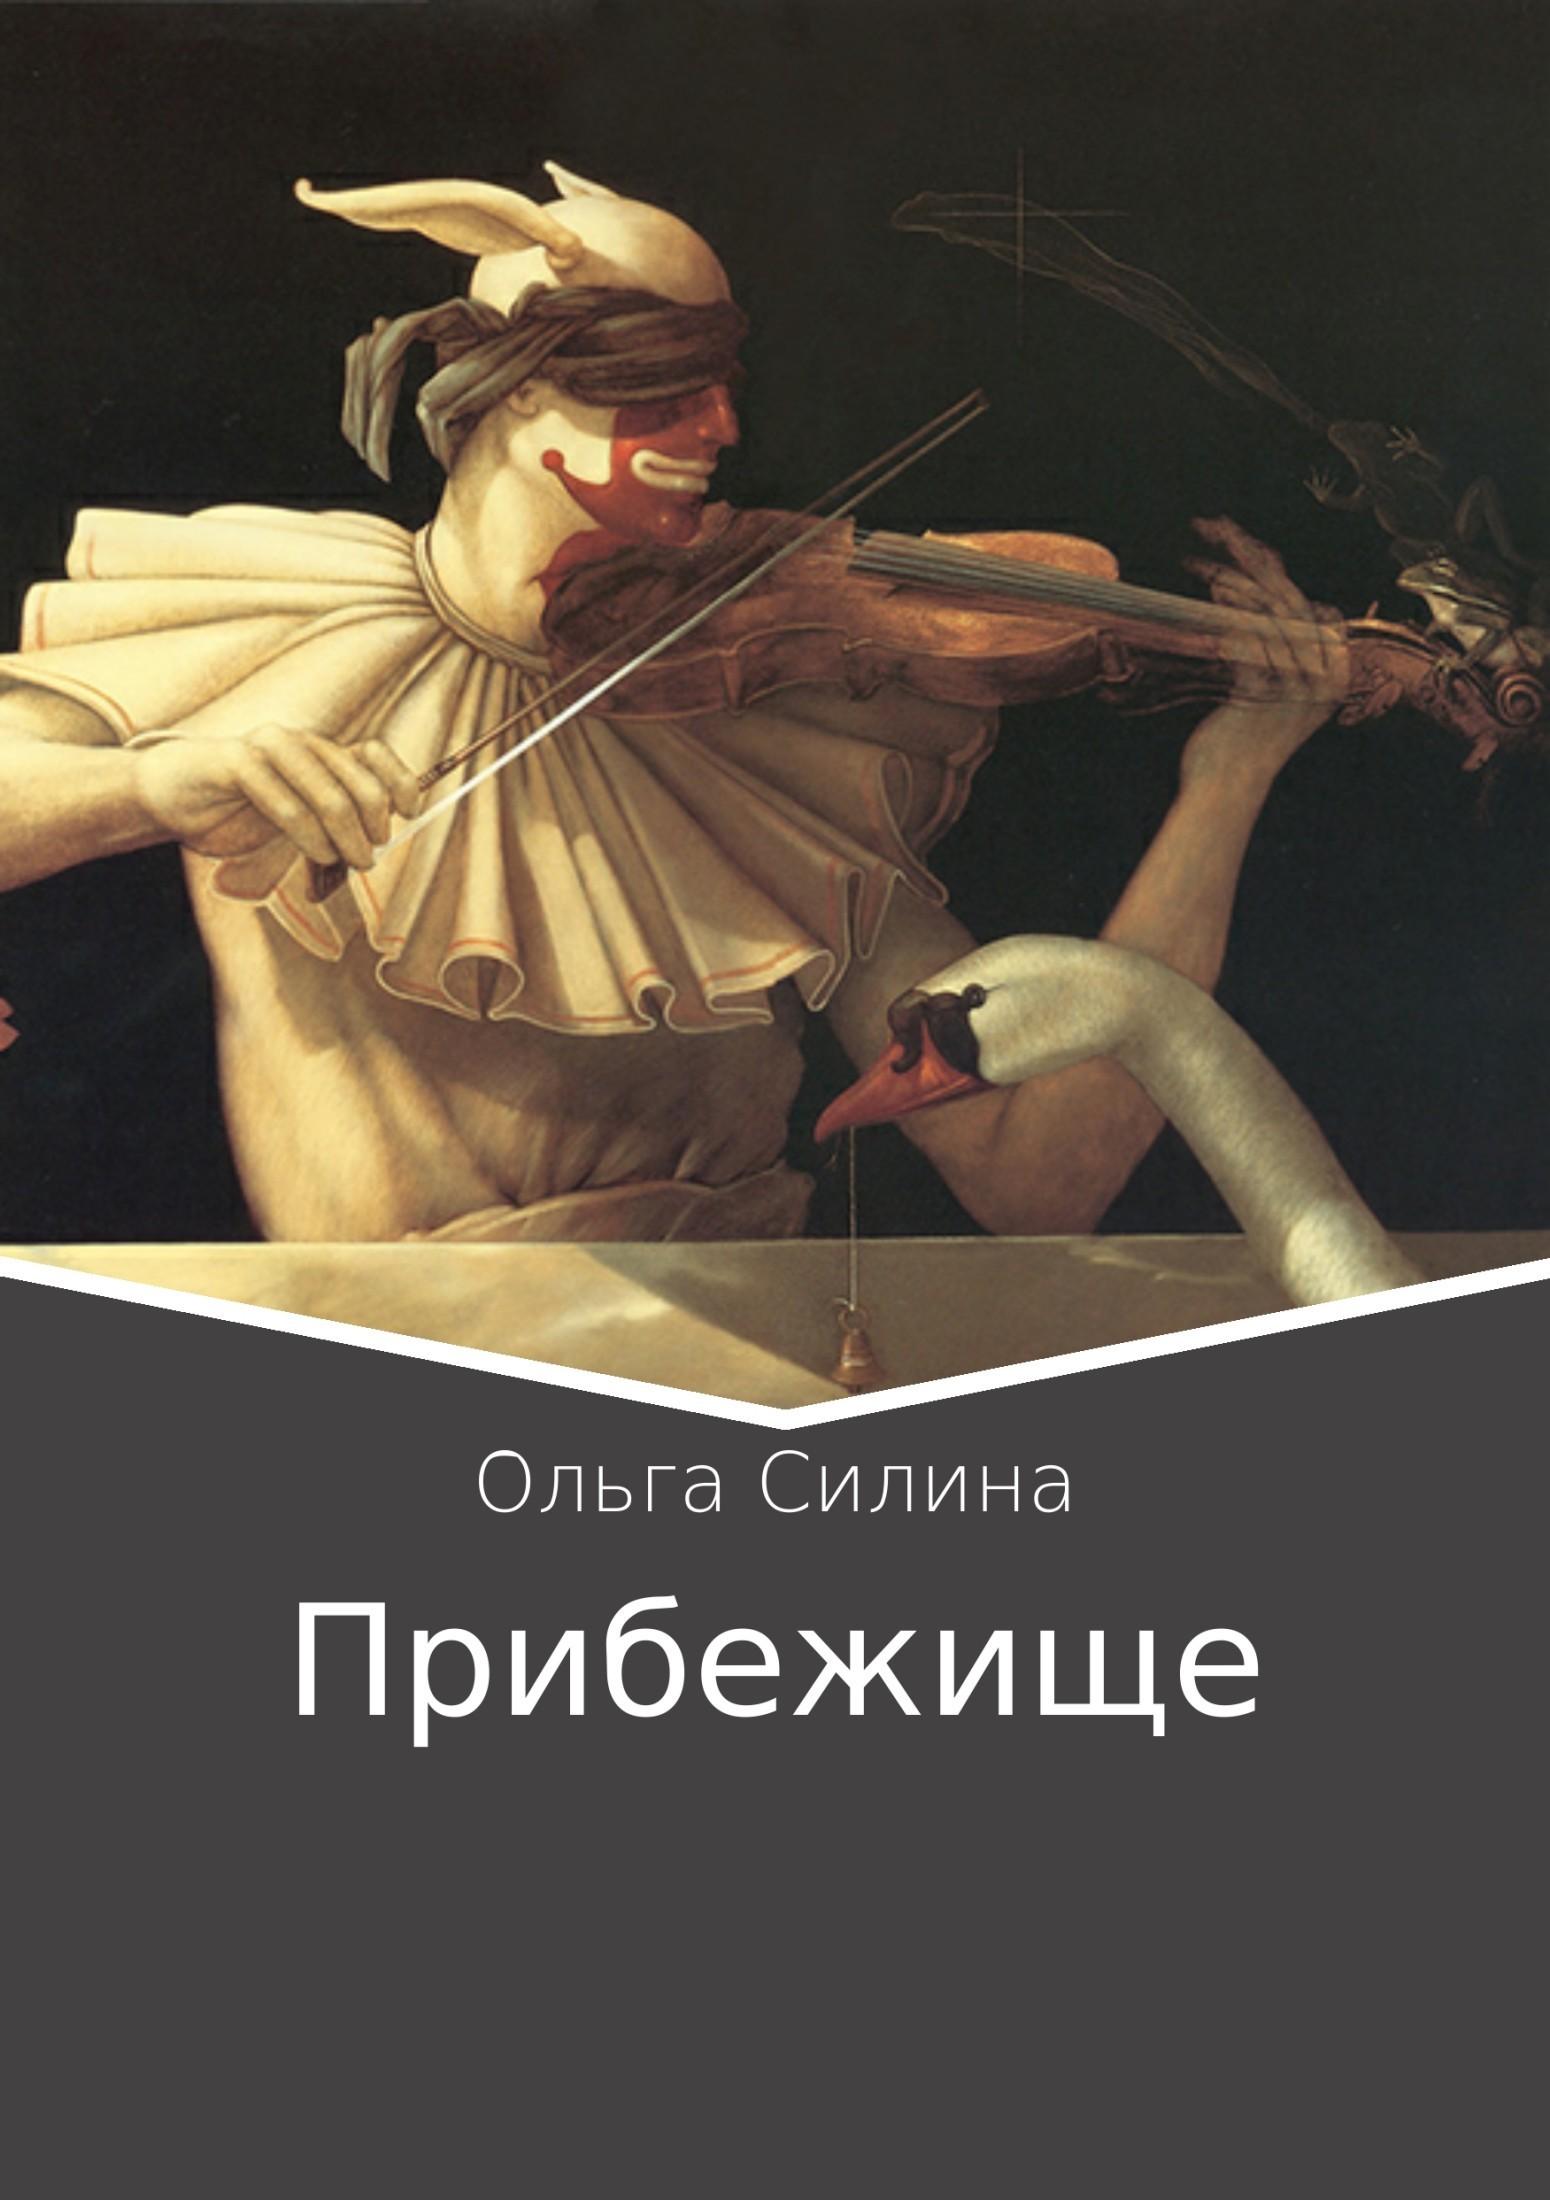 Ольга Силина - Прибежище